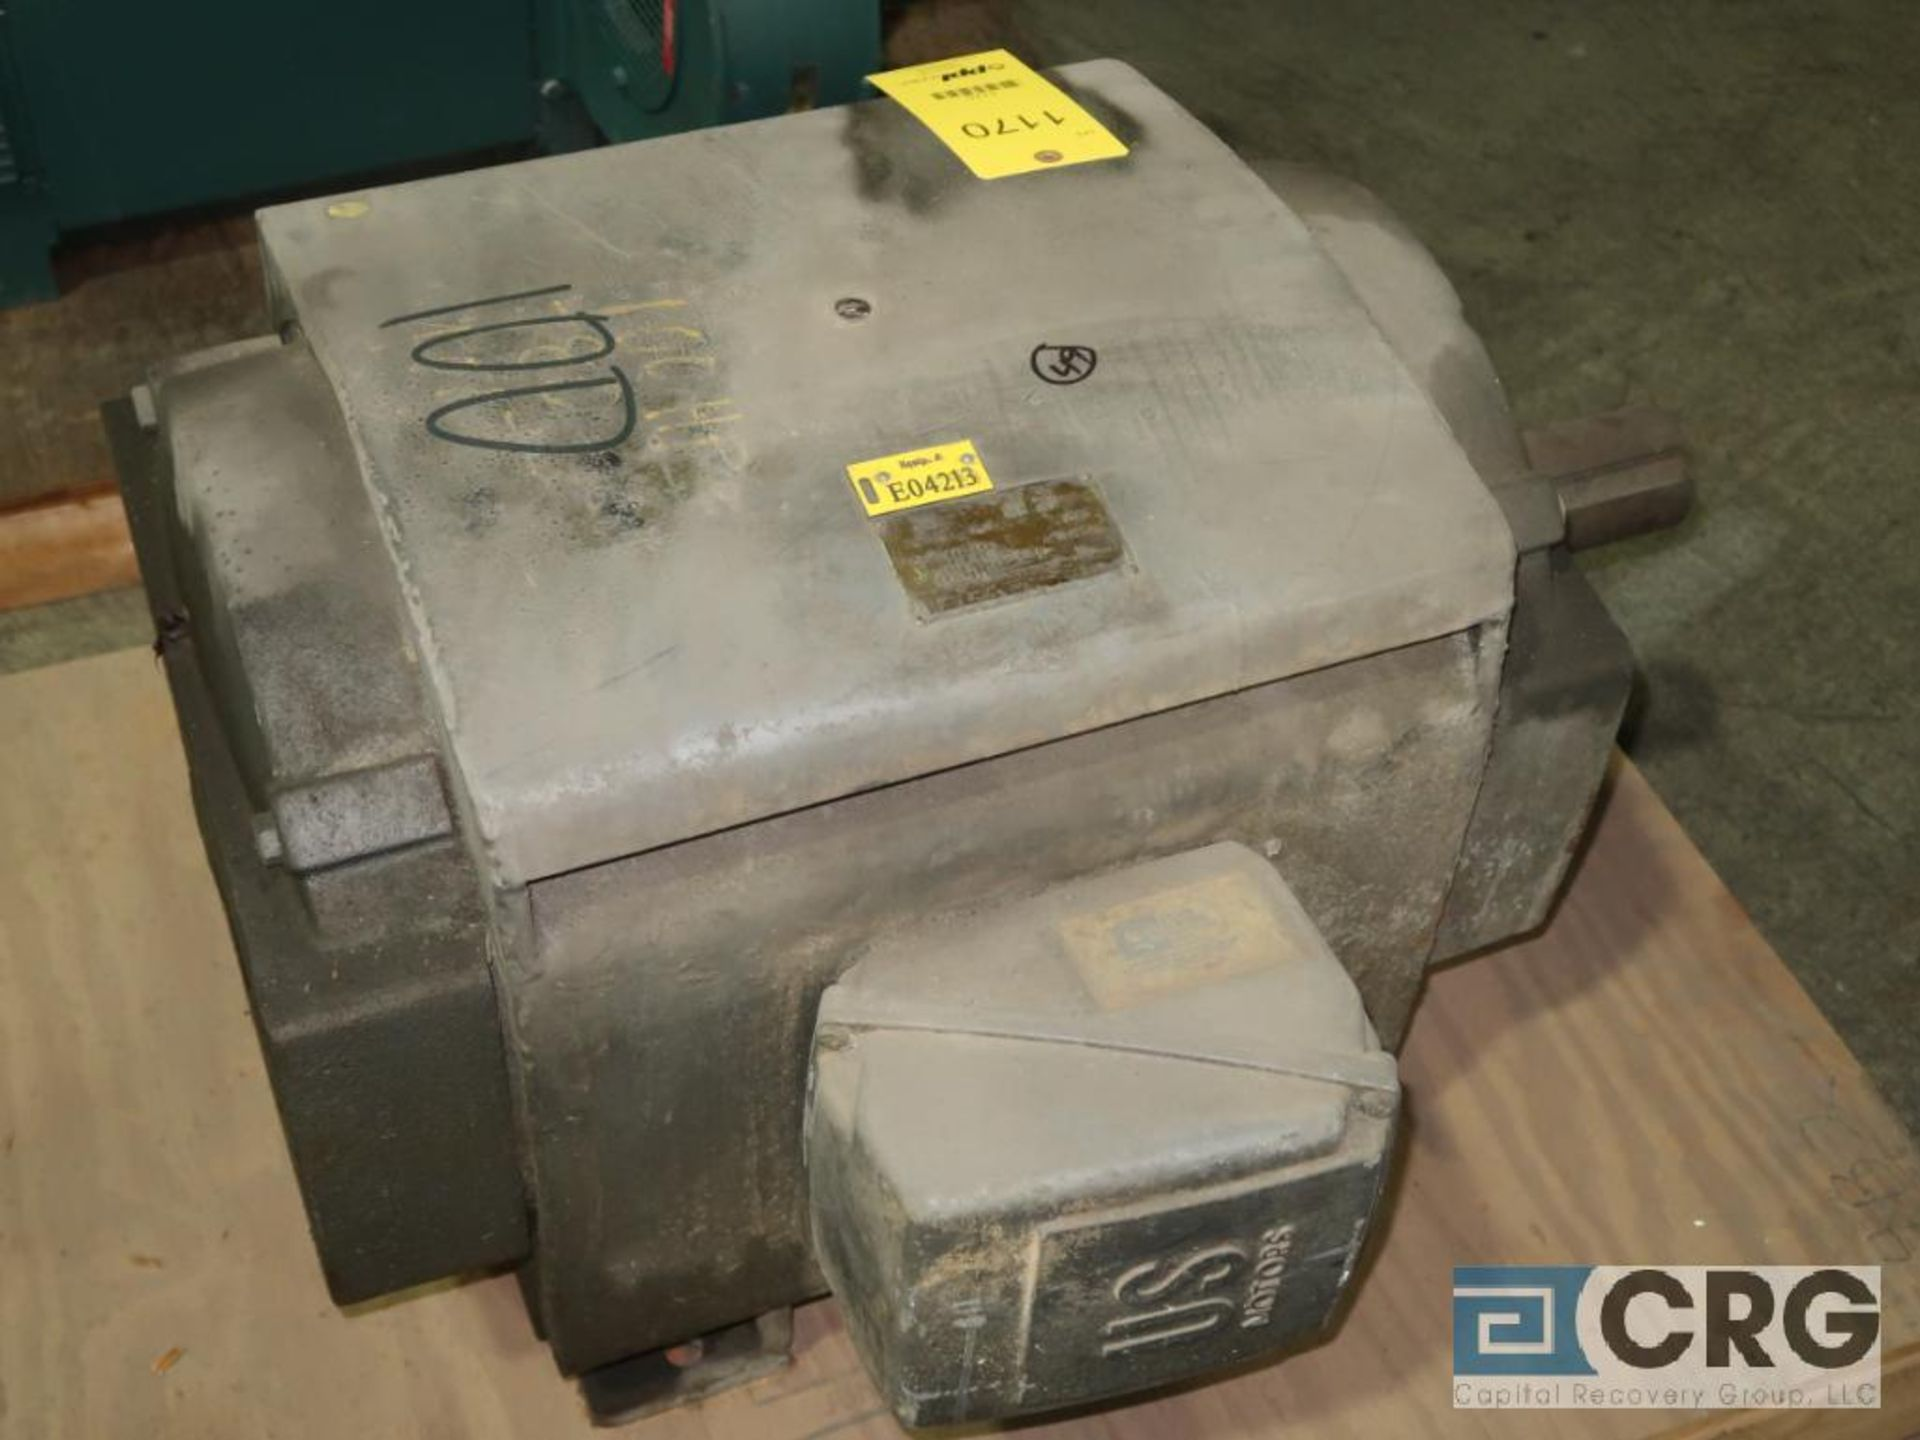 U.S. Electric Motors electric motor, 100 HP, 1,780 RPMs, 230/460 volt, 3 ph., 404T frame (Finish